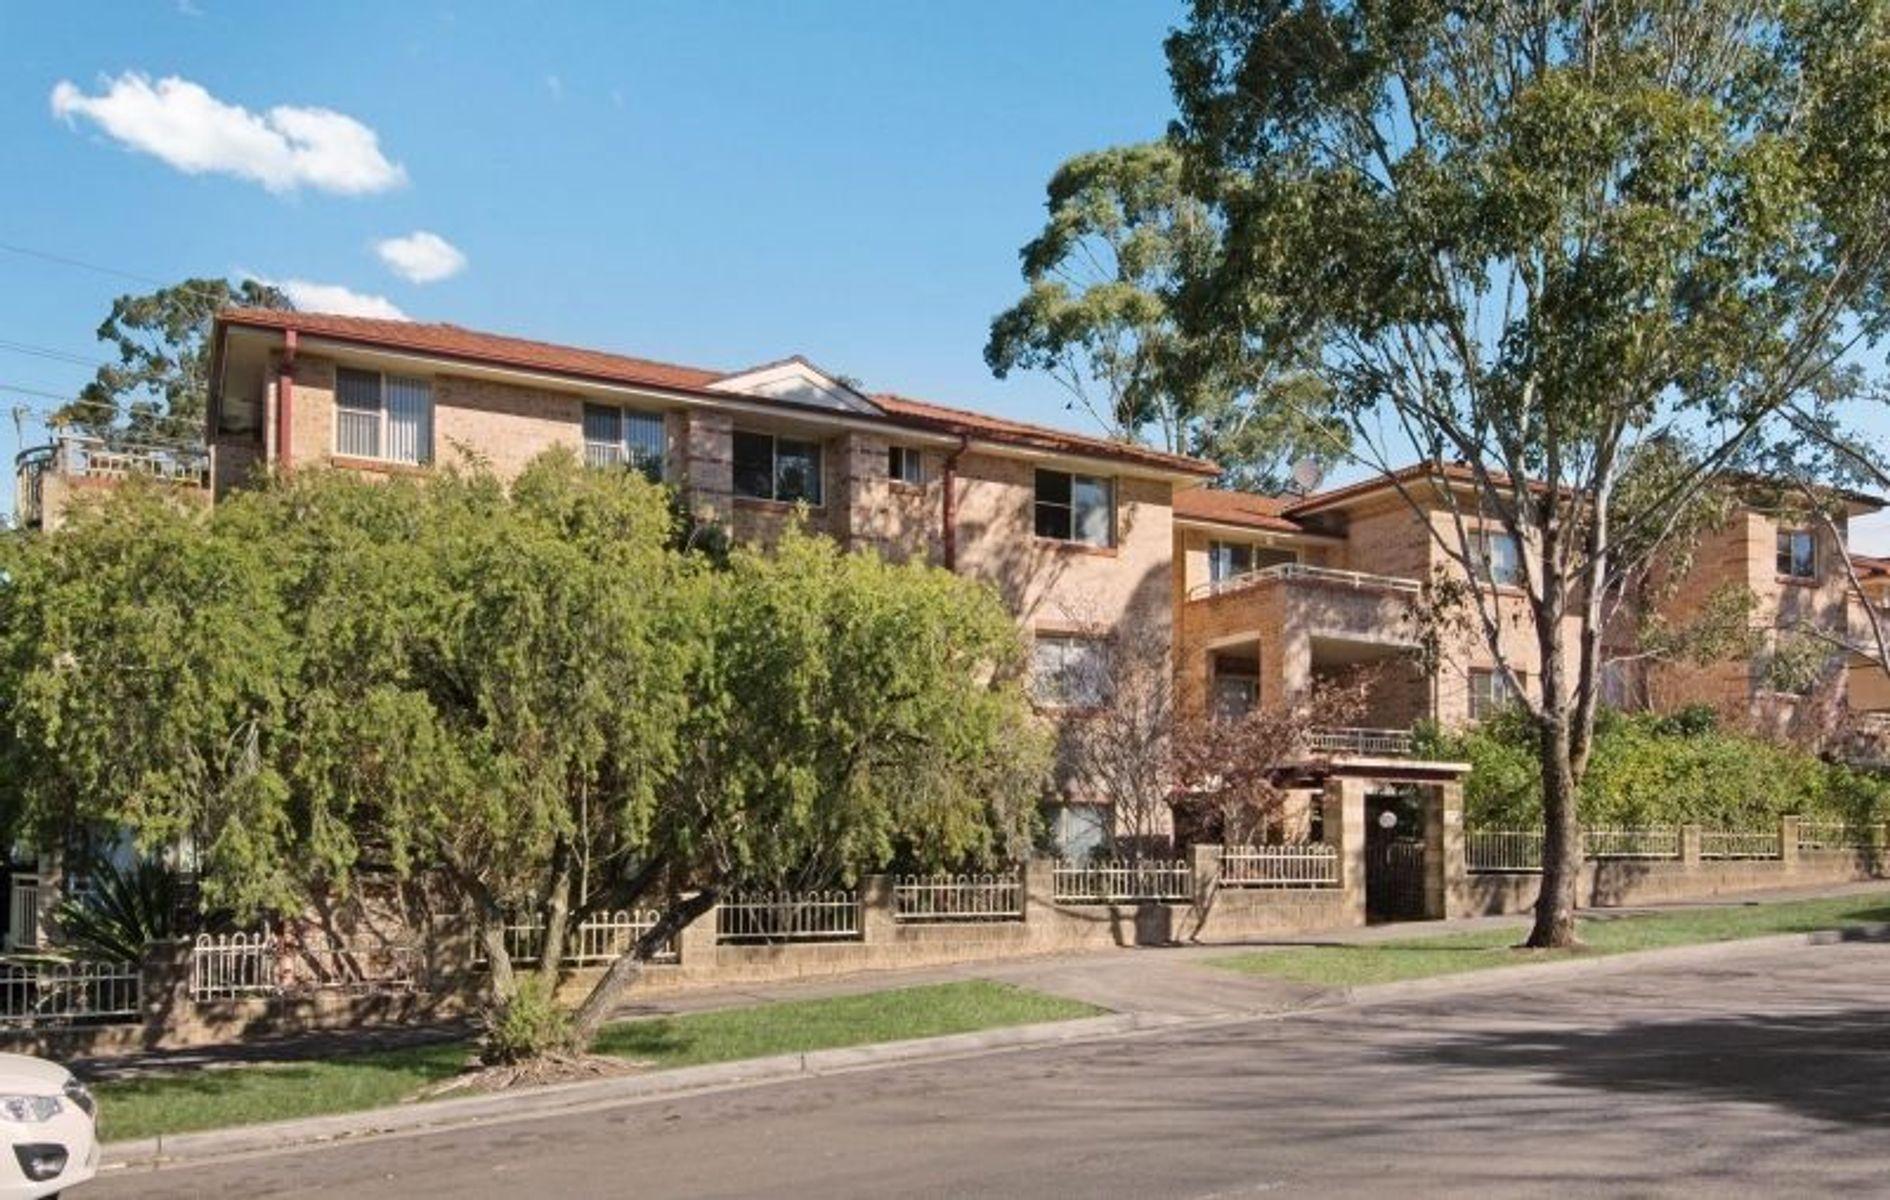 16/53-57 Kenyons Road, Merrylands, NSW 2160